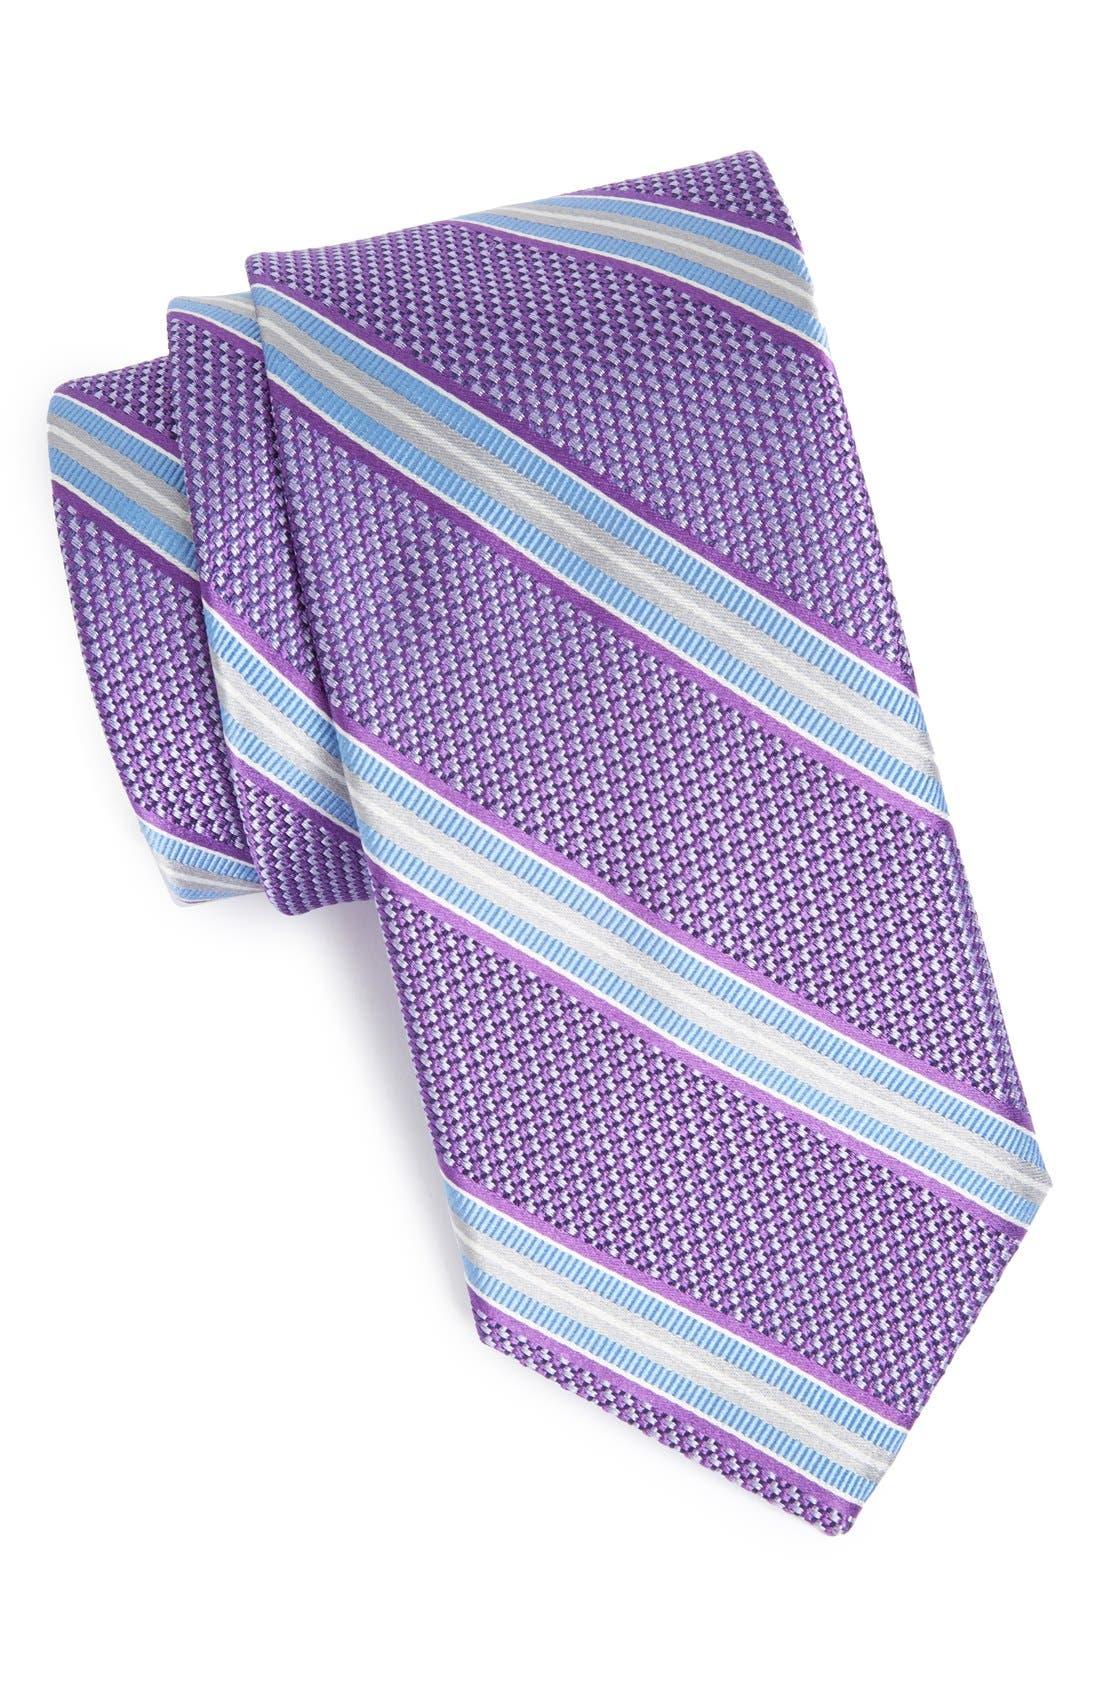 Main Image - John W. Nordstrom® 'Robinson' Woven Silk Tie